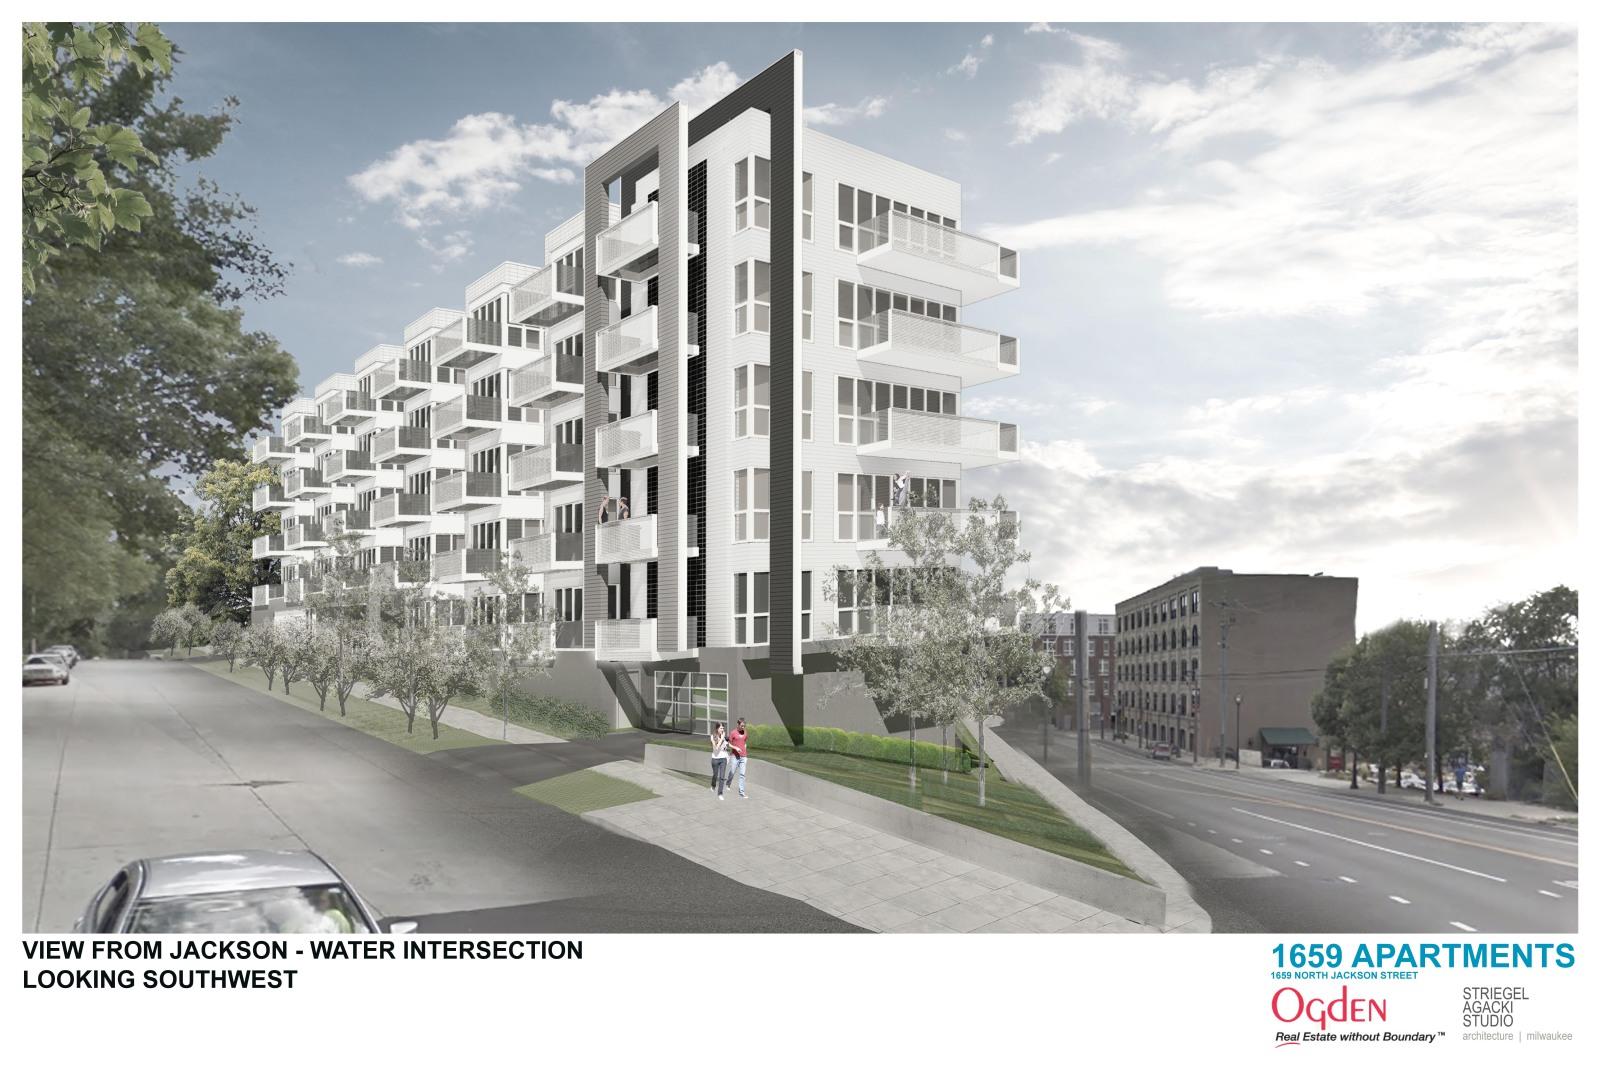 1659 Apartments Rendering